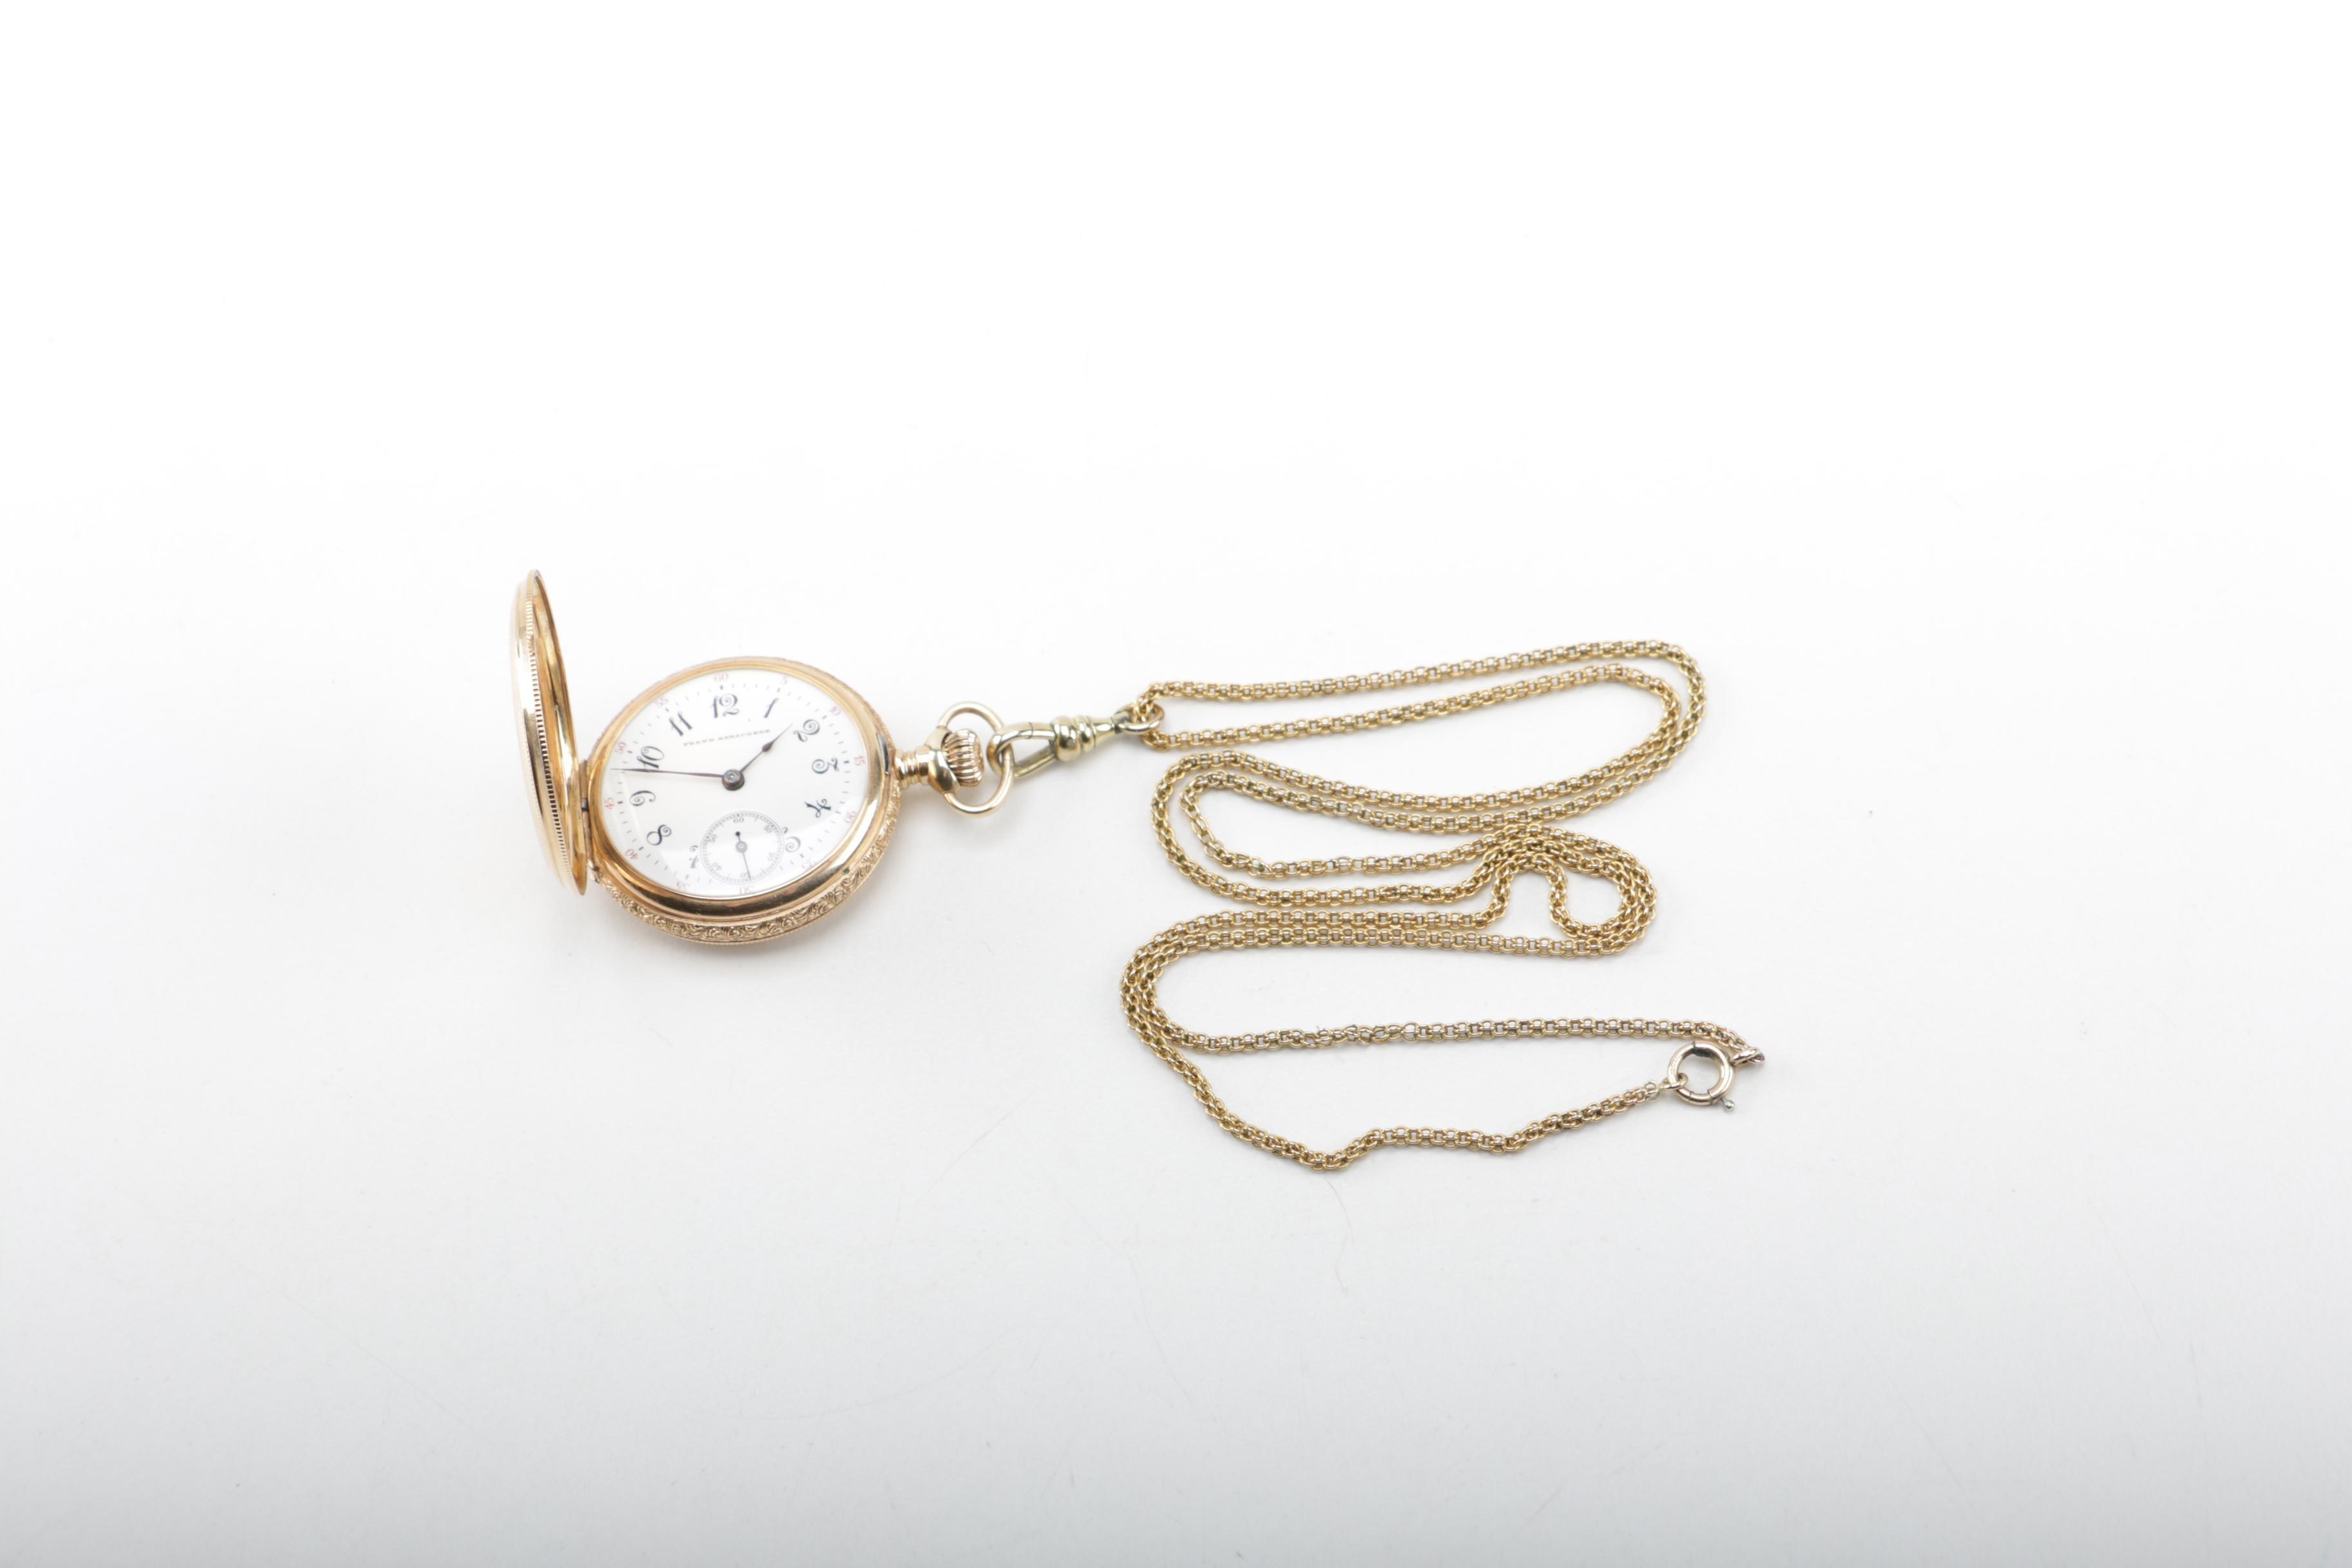 14K Yellow Gold Gruen Pocket Watch and Chain